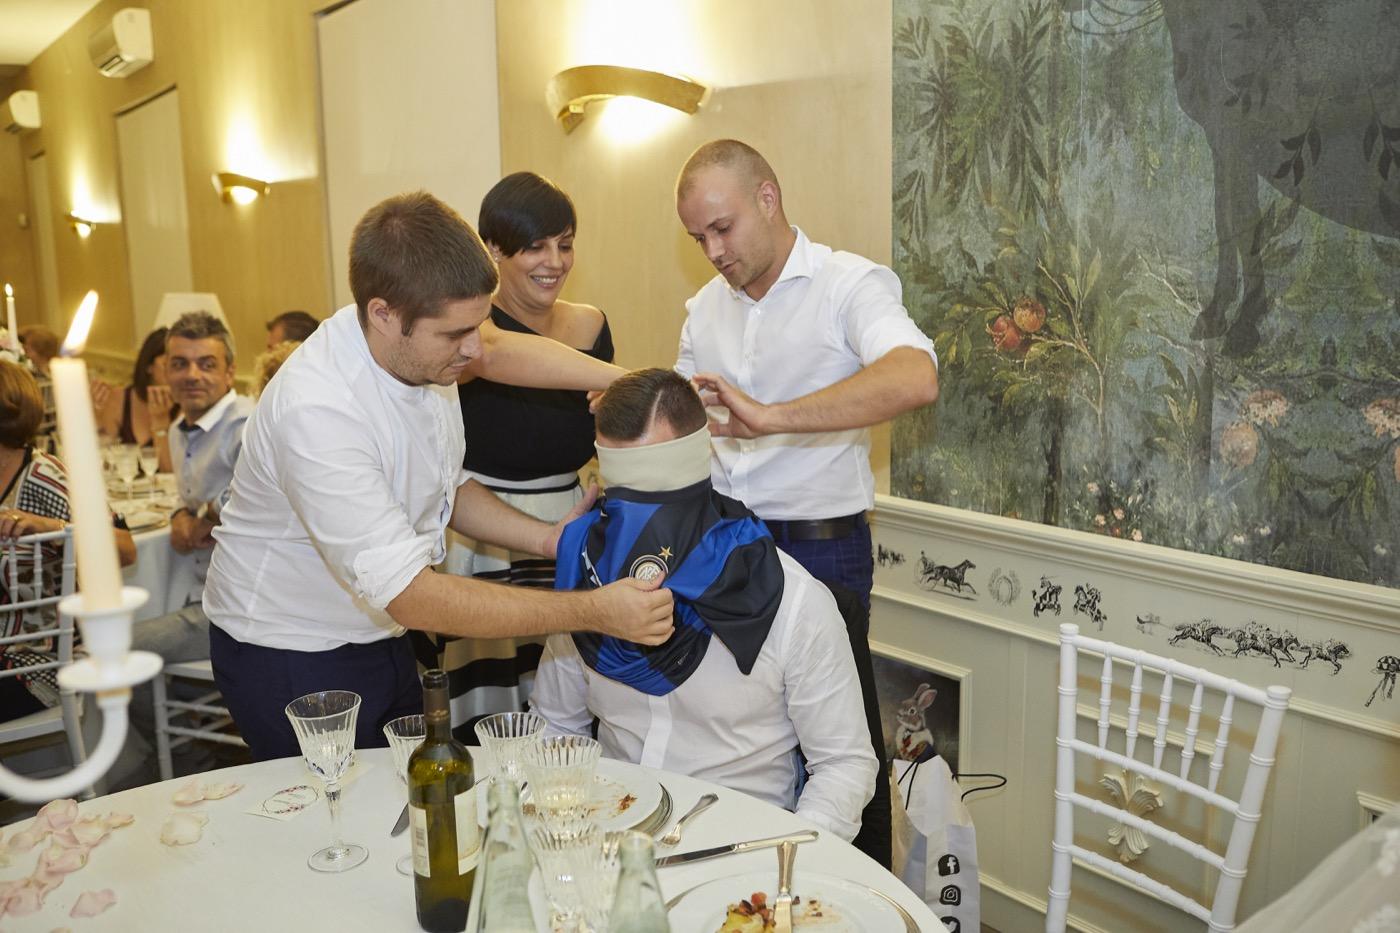 Claudio-Coppola-wedding-photographer-la-scuderia-eventi-preparativi-la-rosetta-perugia-84